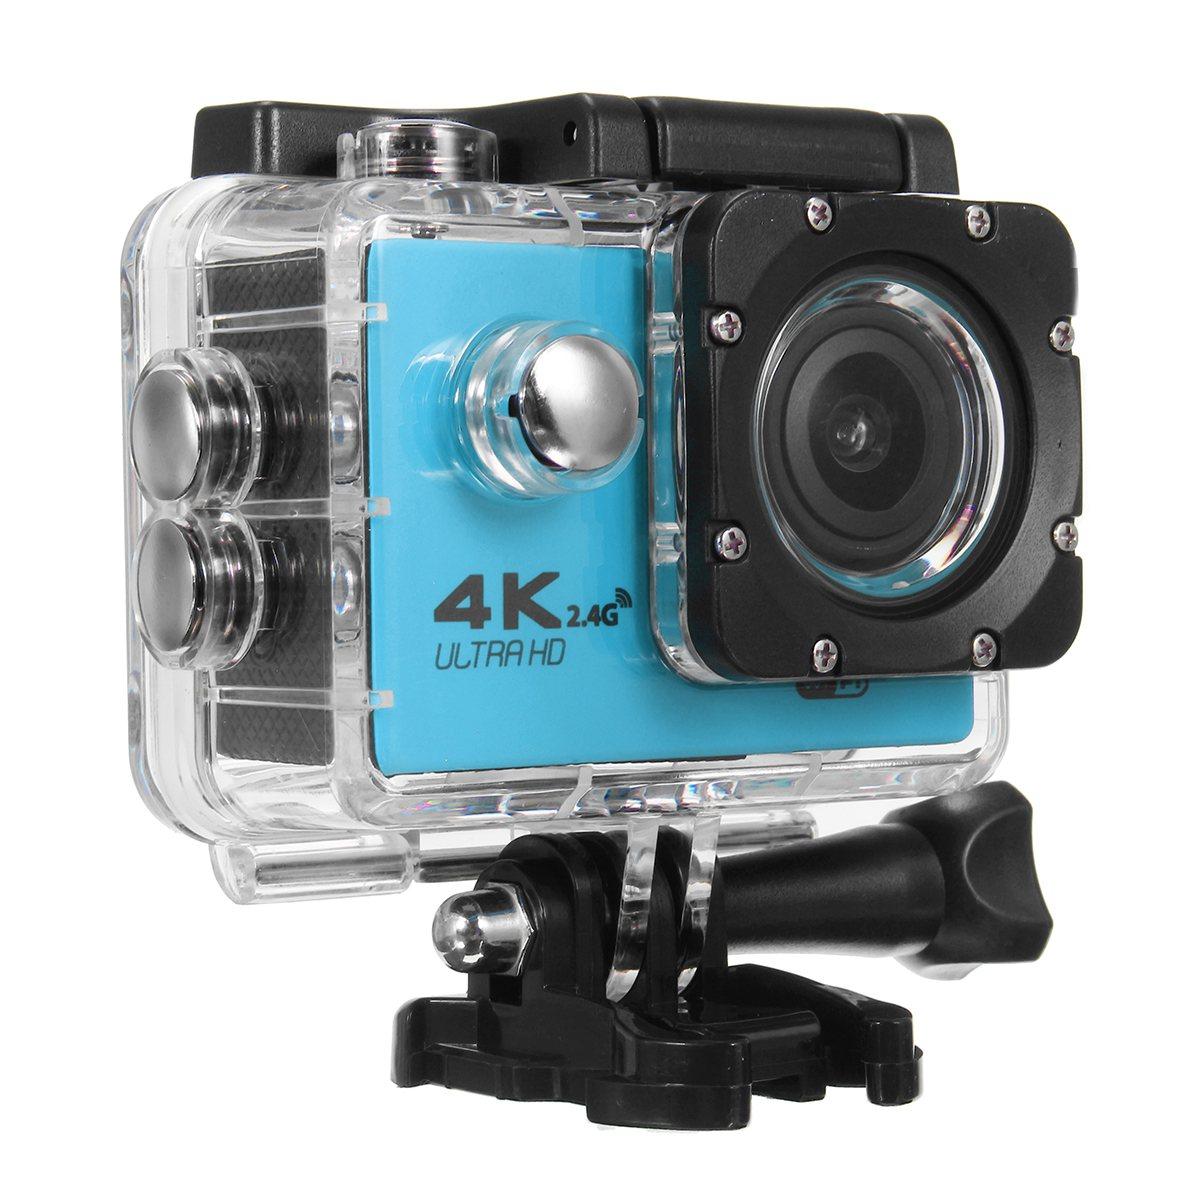 Hot Selling pro underwater waterproof Action Camera F60R Ultra HD 4K /30fps WiFi 2.0 170D go Helmet Cam Sport Consumer Camera